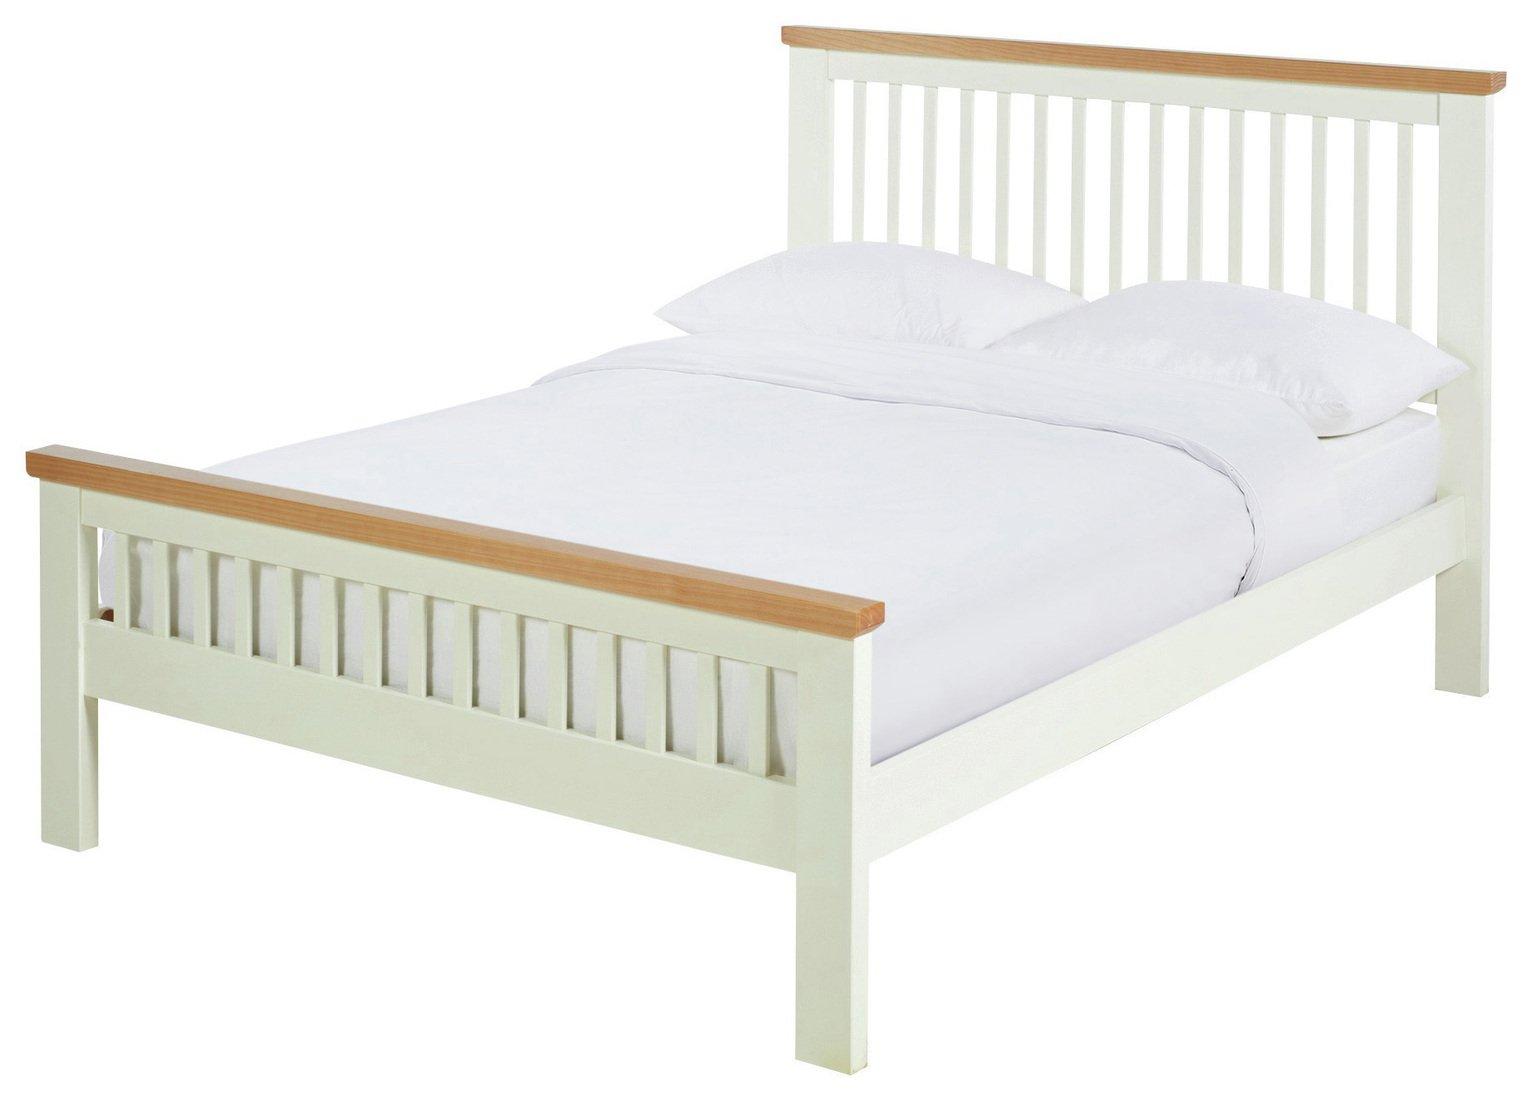 Argos Home Aubrey Kingsize Bed Frame - Two Tone